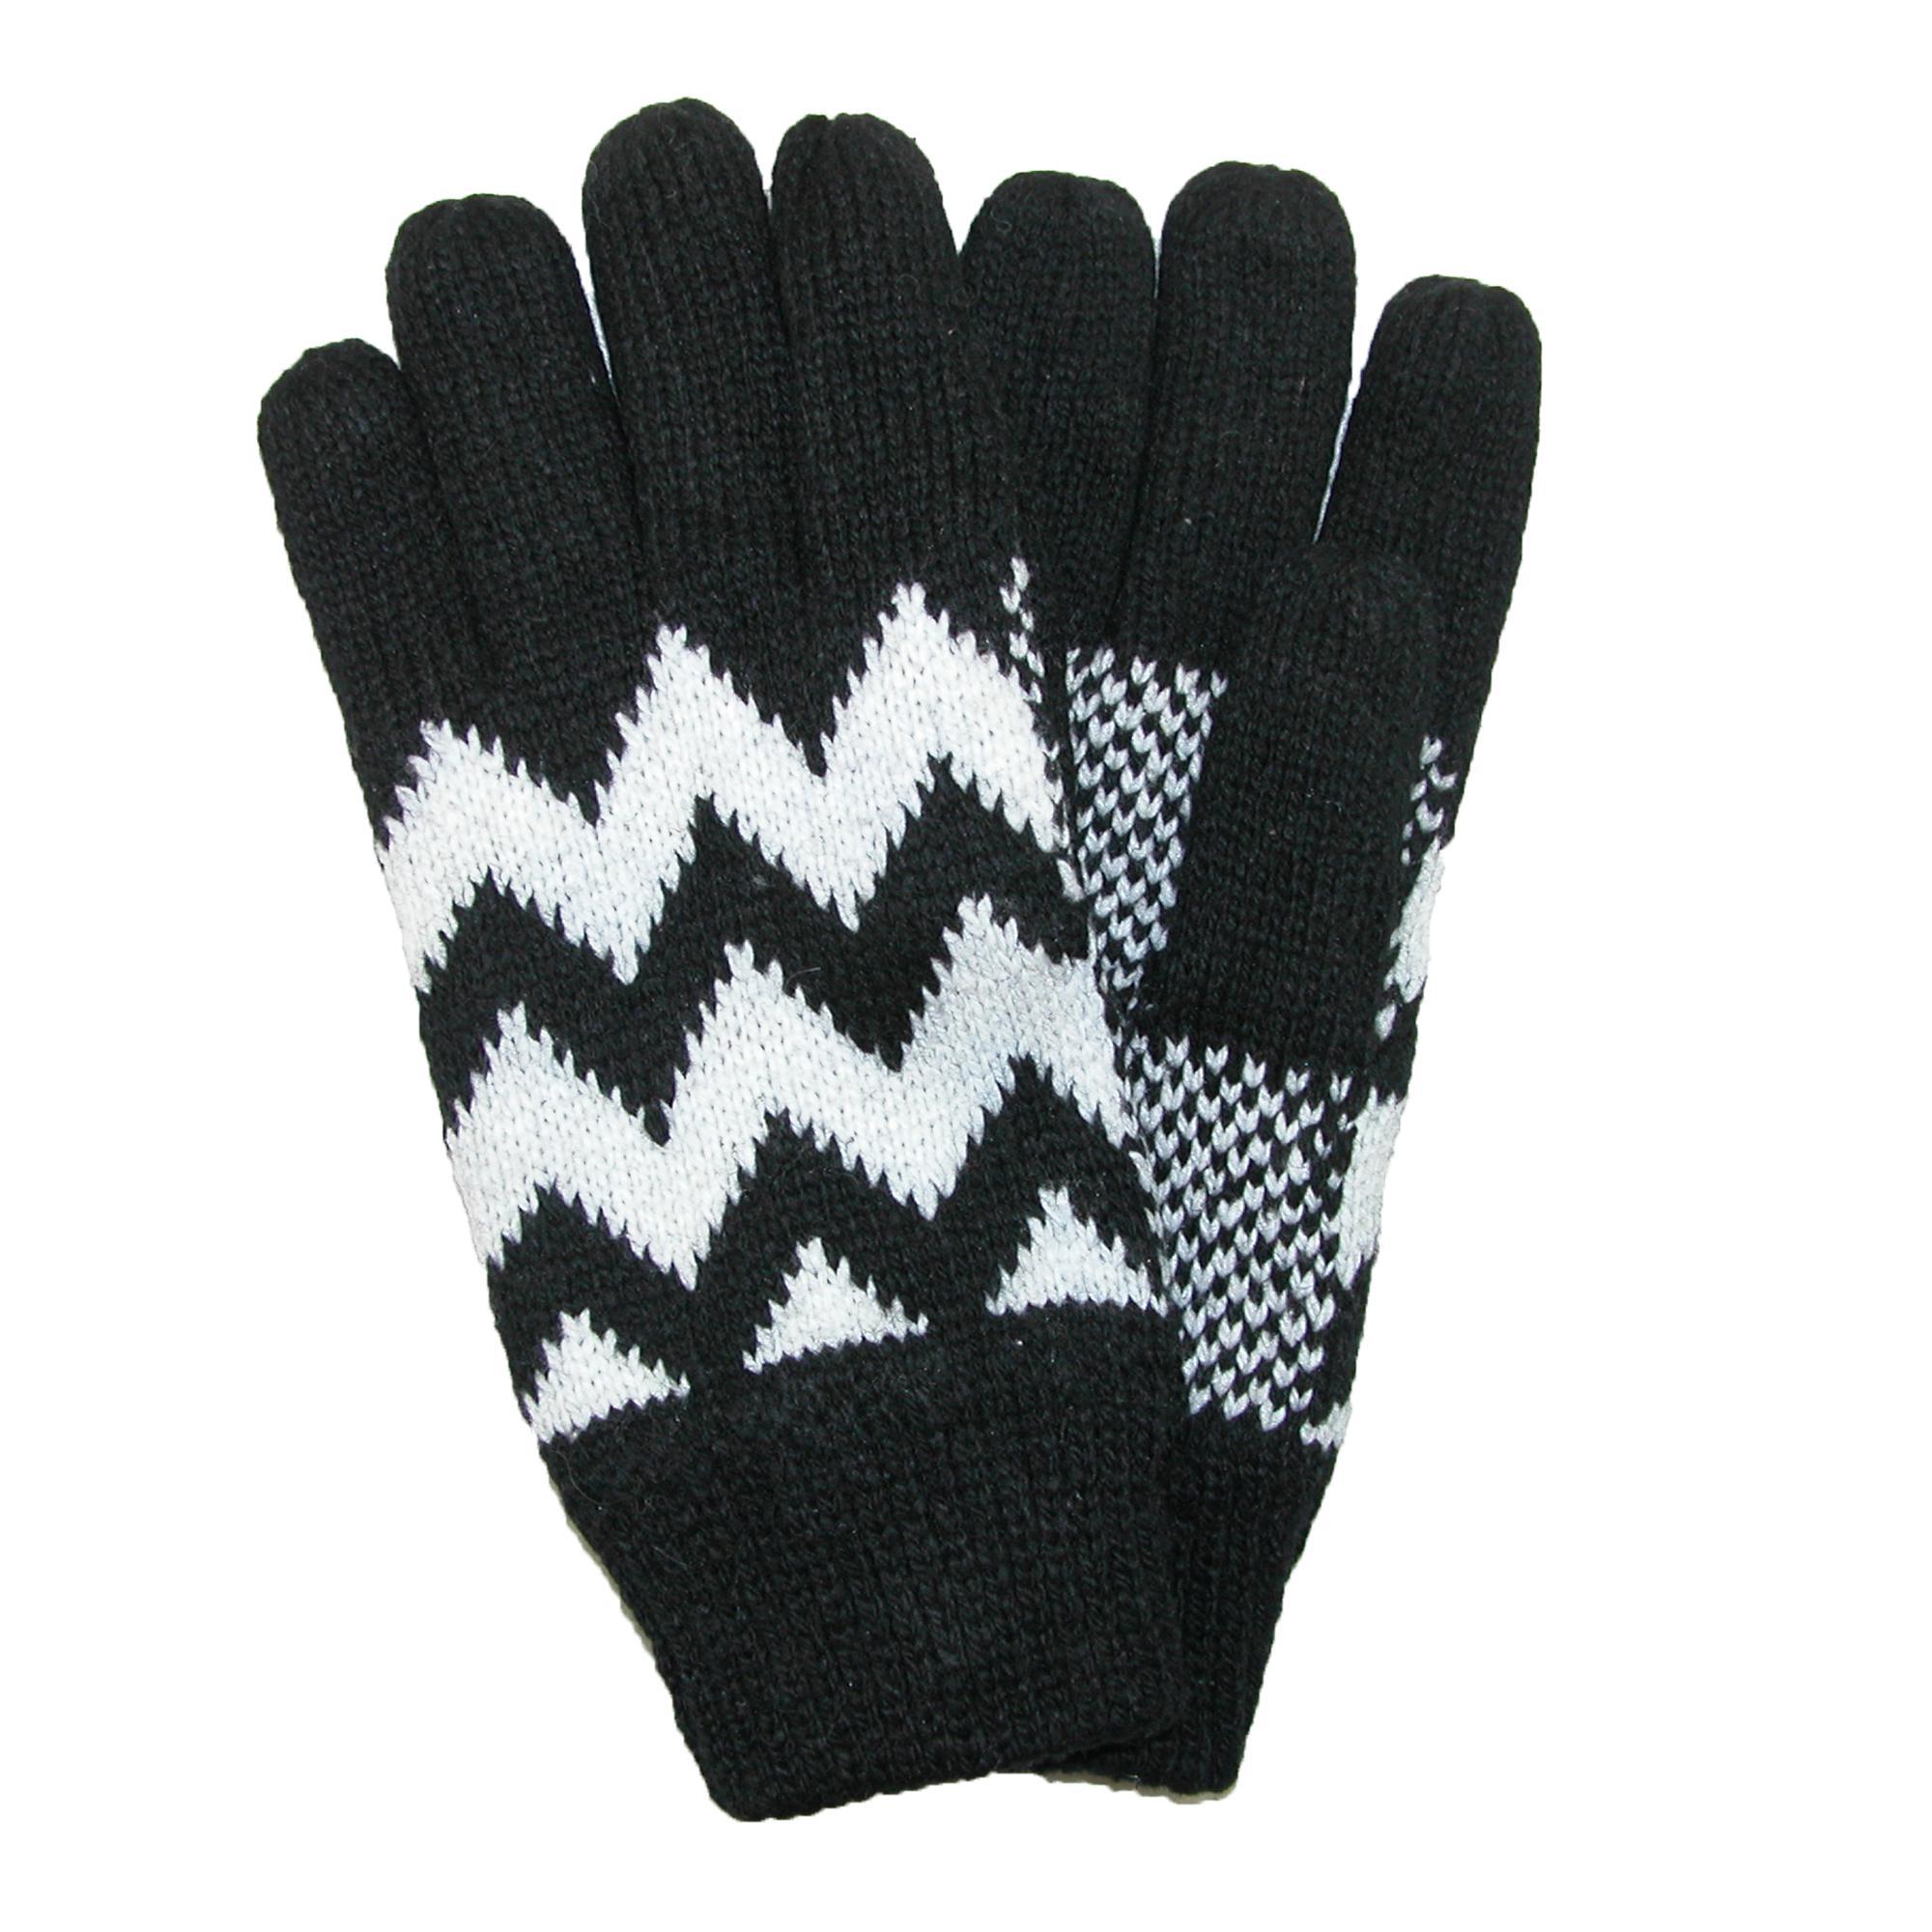 CTM Men's Fleece Lined Knit Gloves with Zig Zag